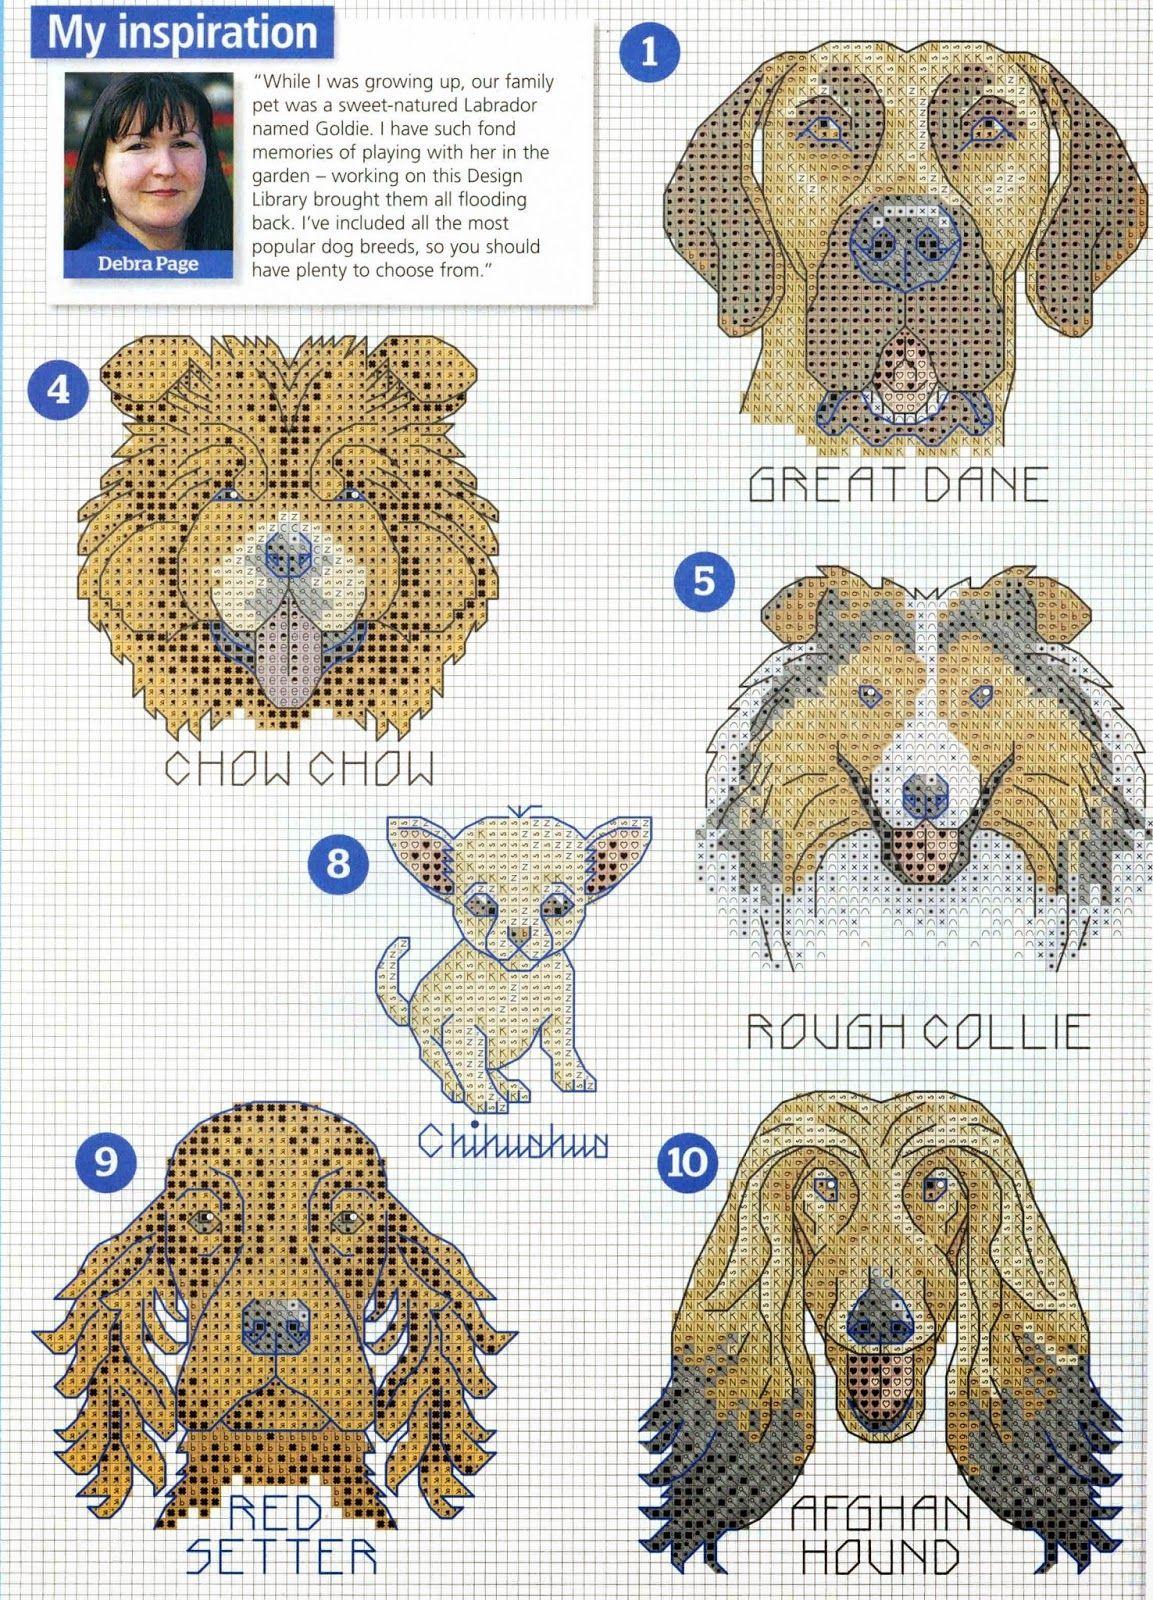 Pin de Brit Darington en Charted Designs - Part 1 | Pinterest ...